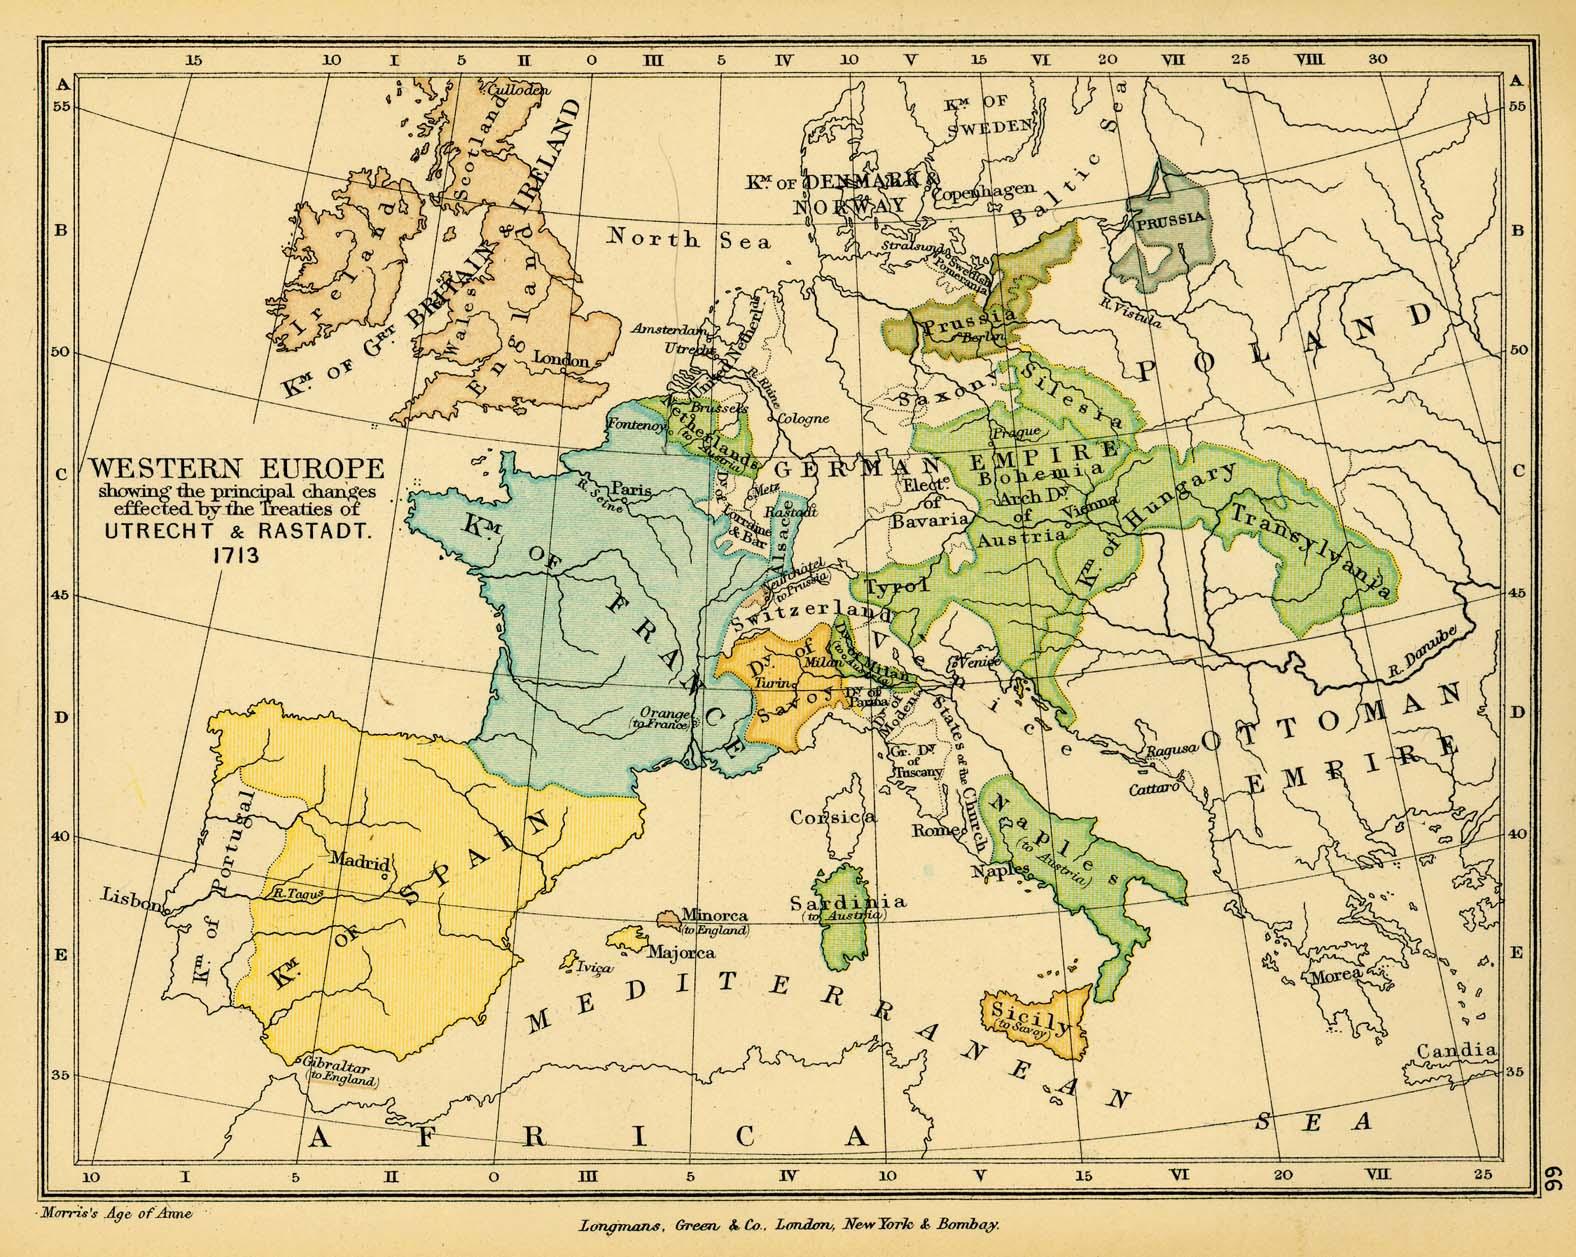 Western Europe after the  Treaties of Utrecht & Rastatt 1713